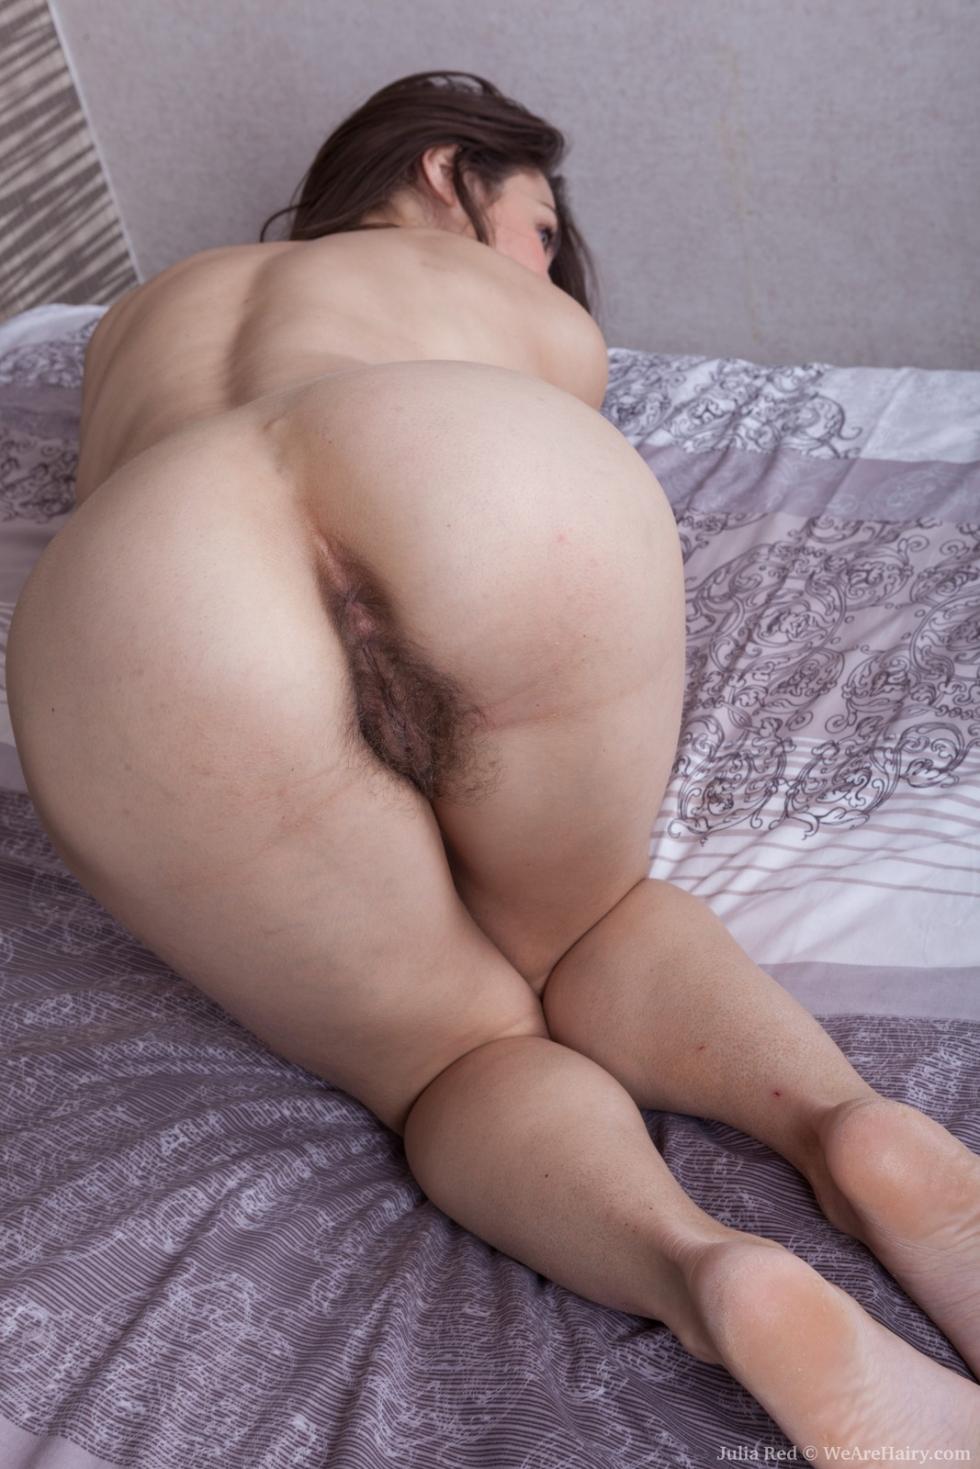 Free butt porn pics idea